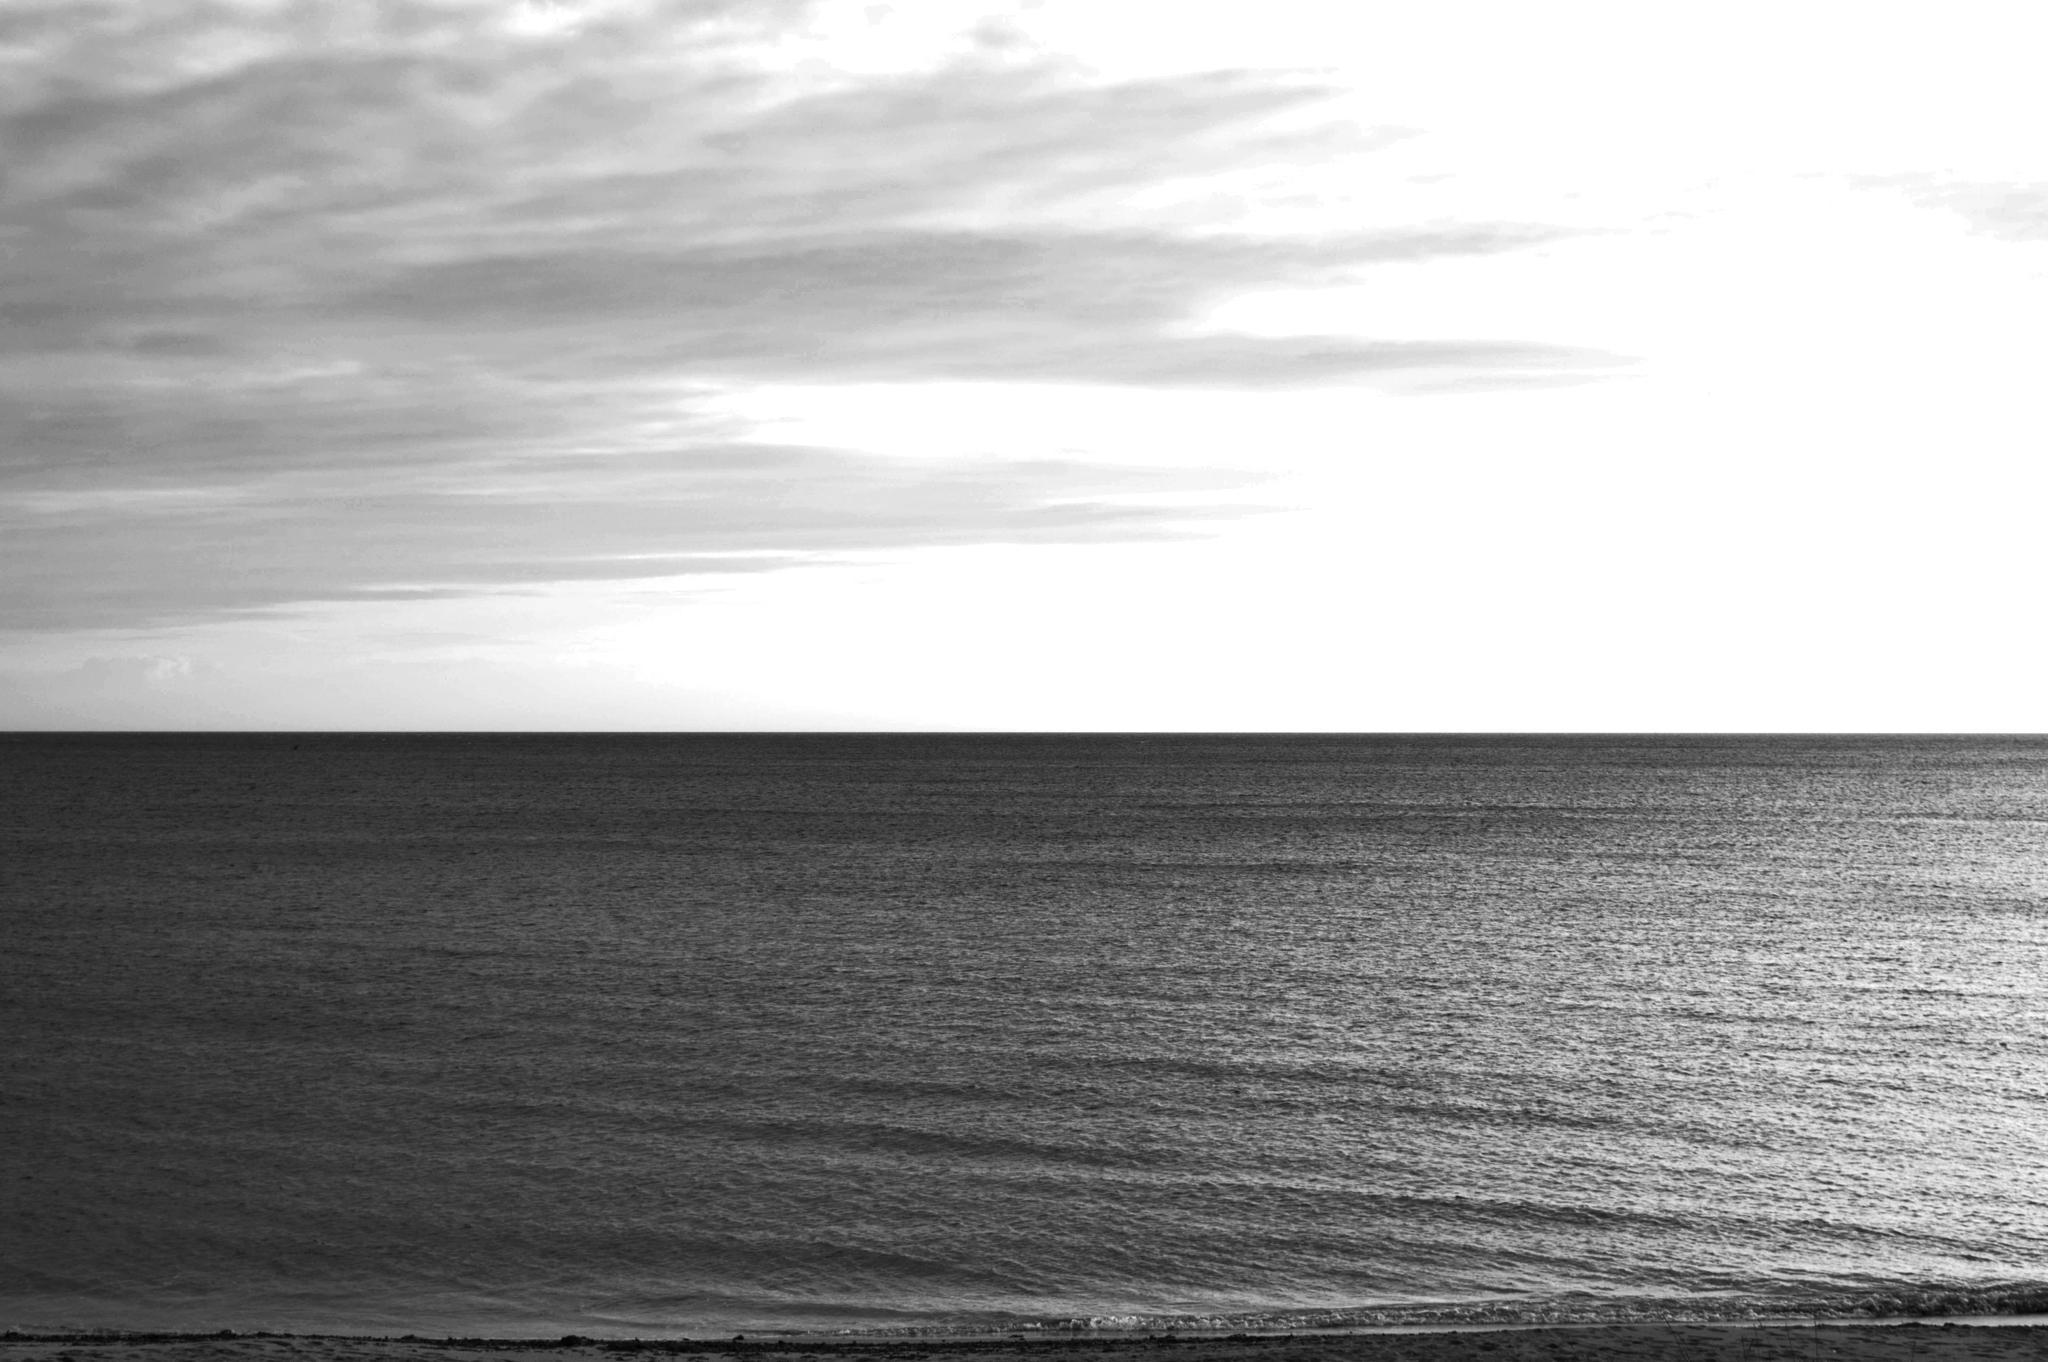 Sea & Sky by Deeno